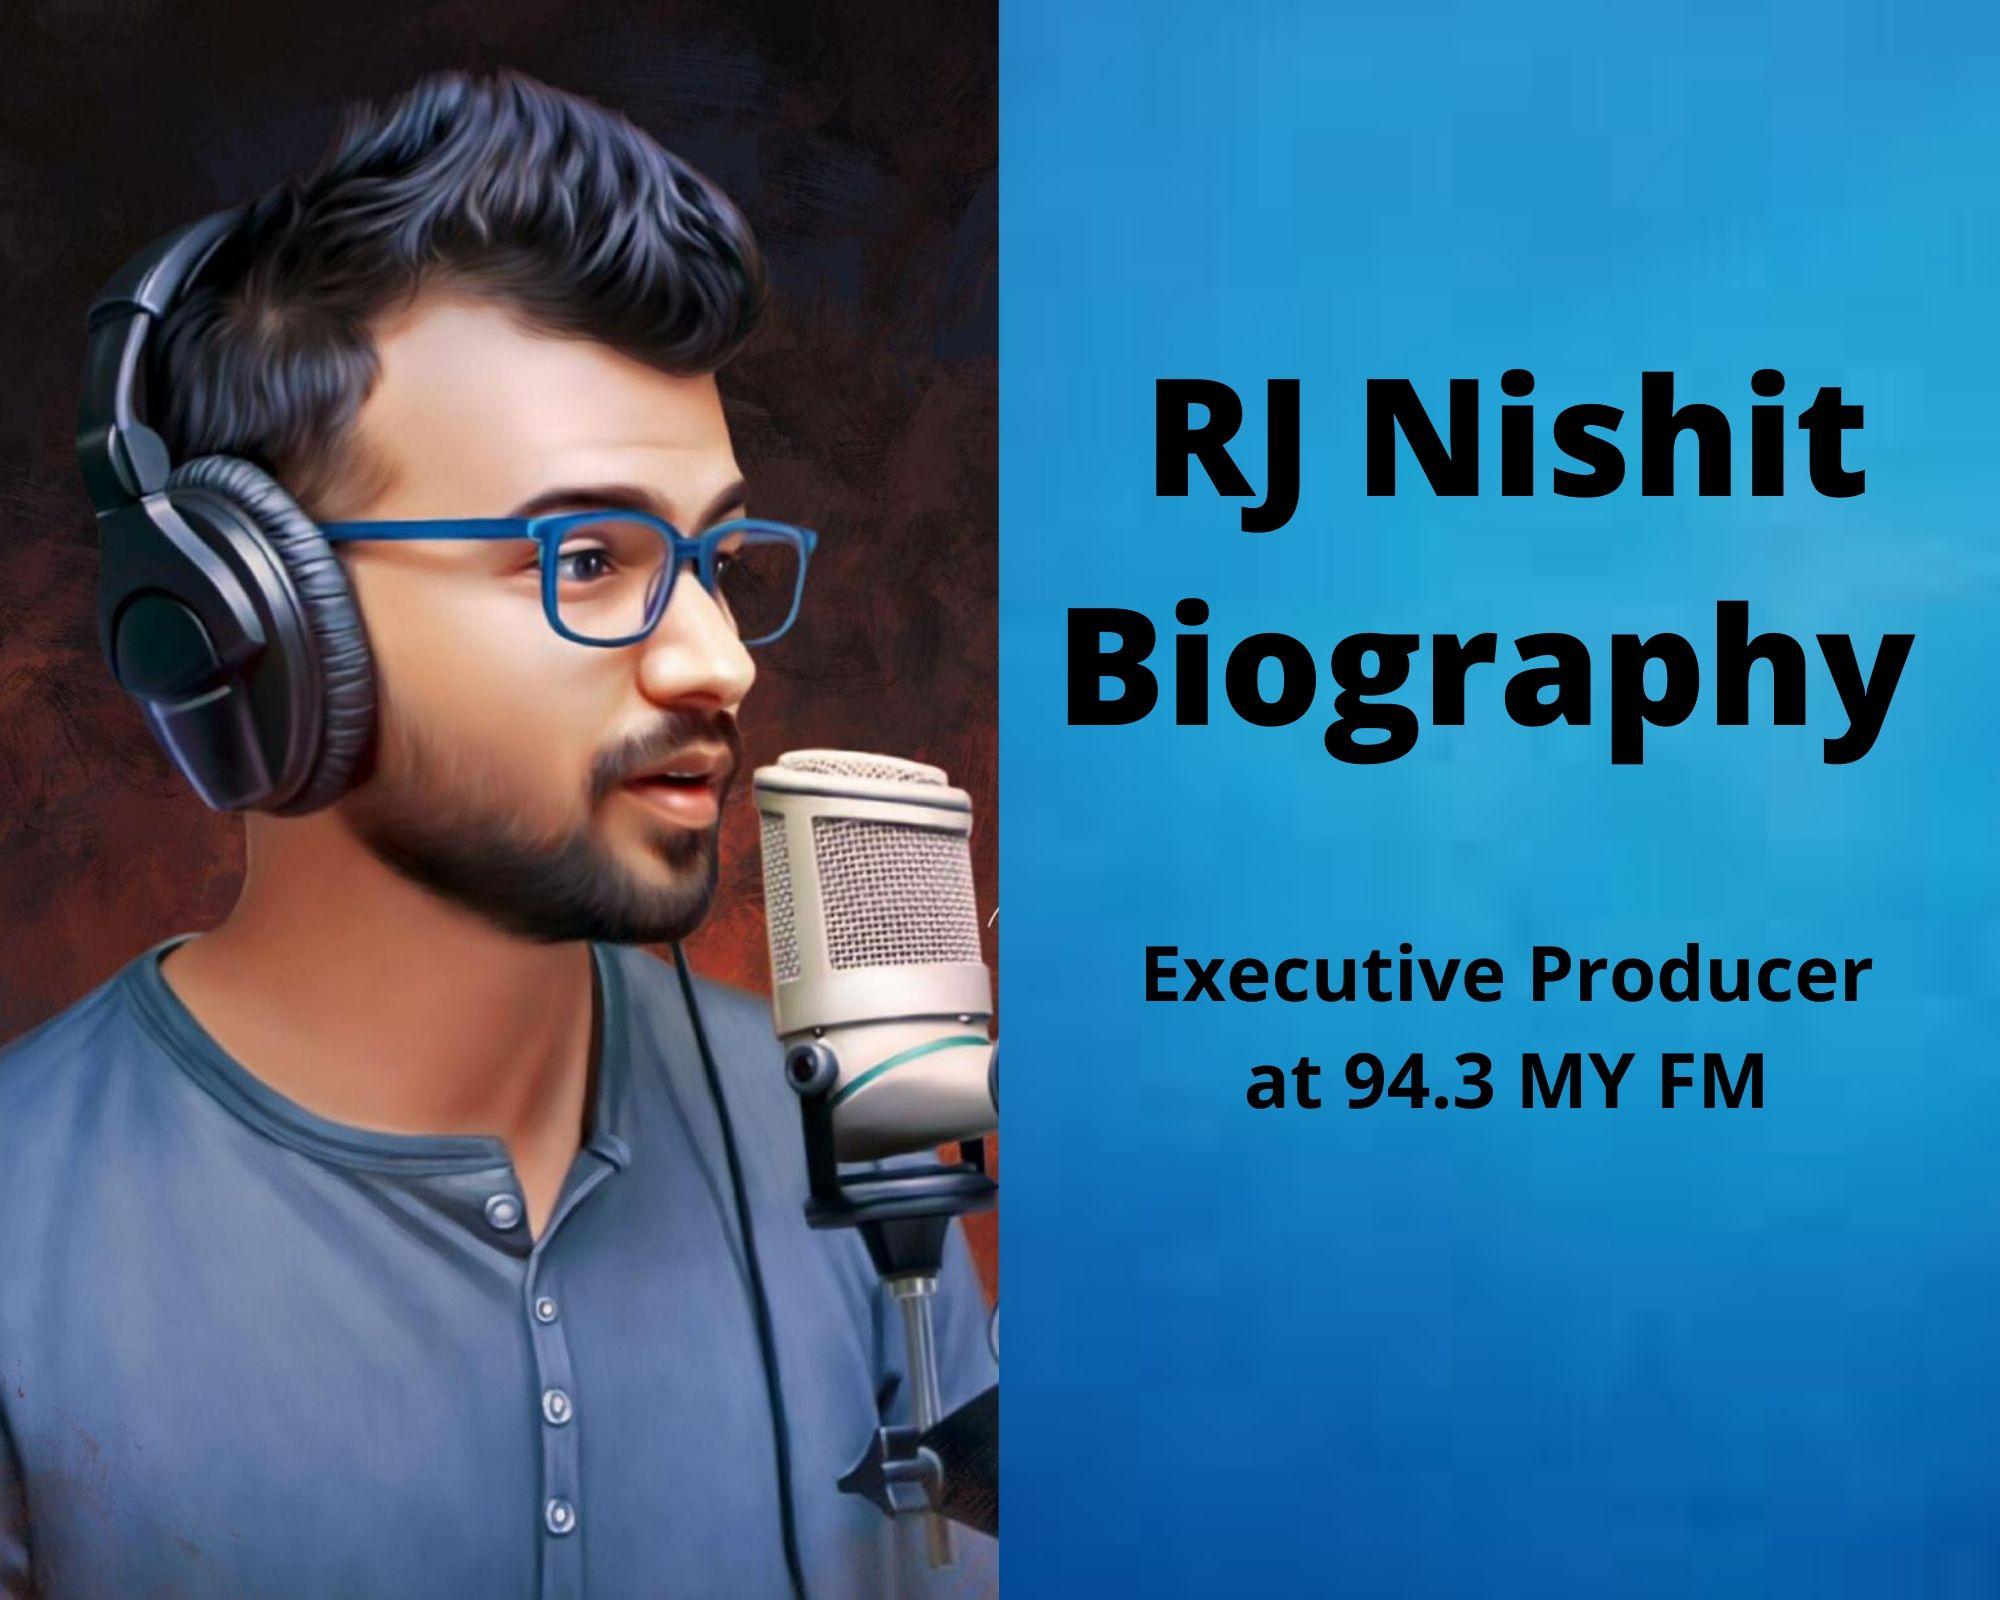 RJ Nishit Biography | Executive Producer at 94.3 MY FM